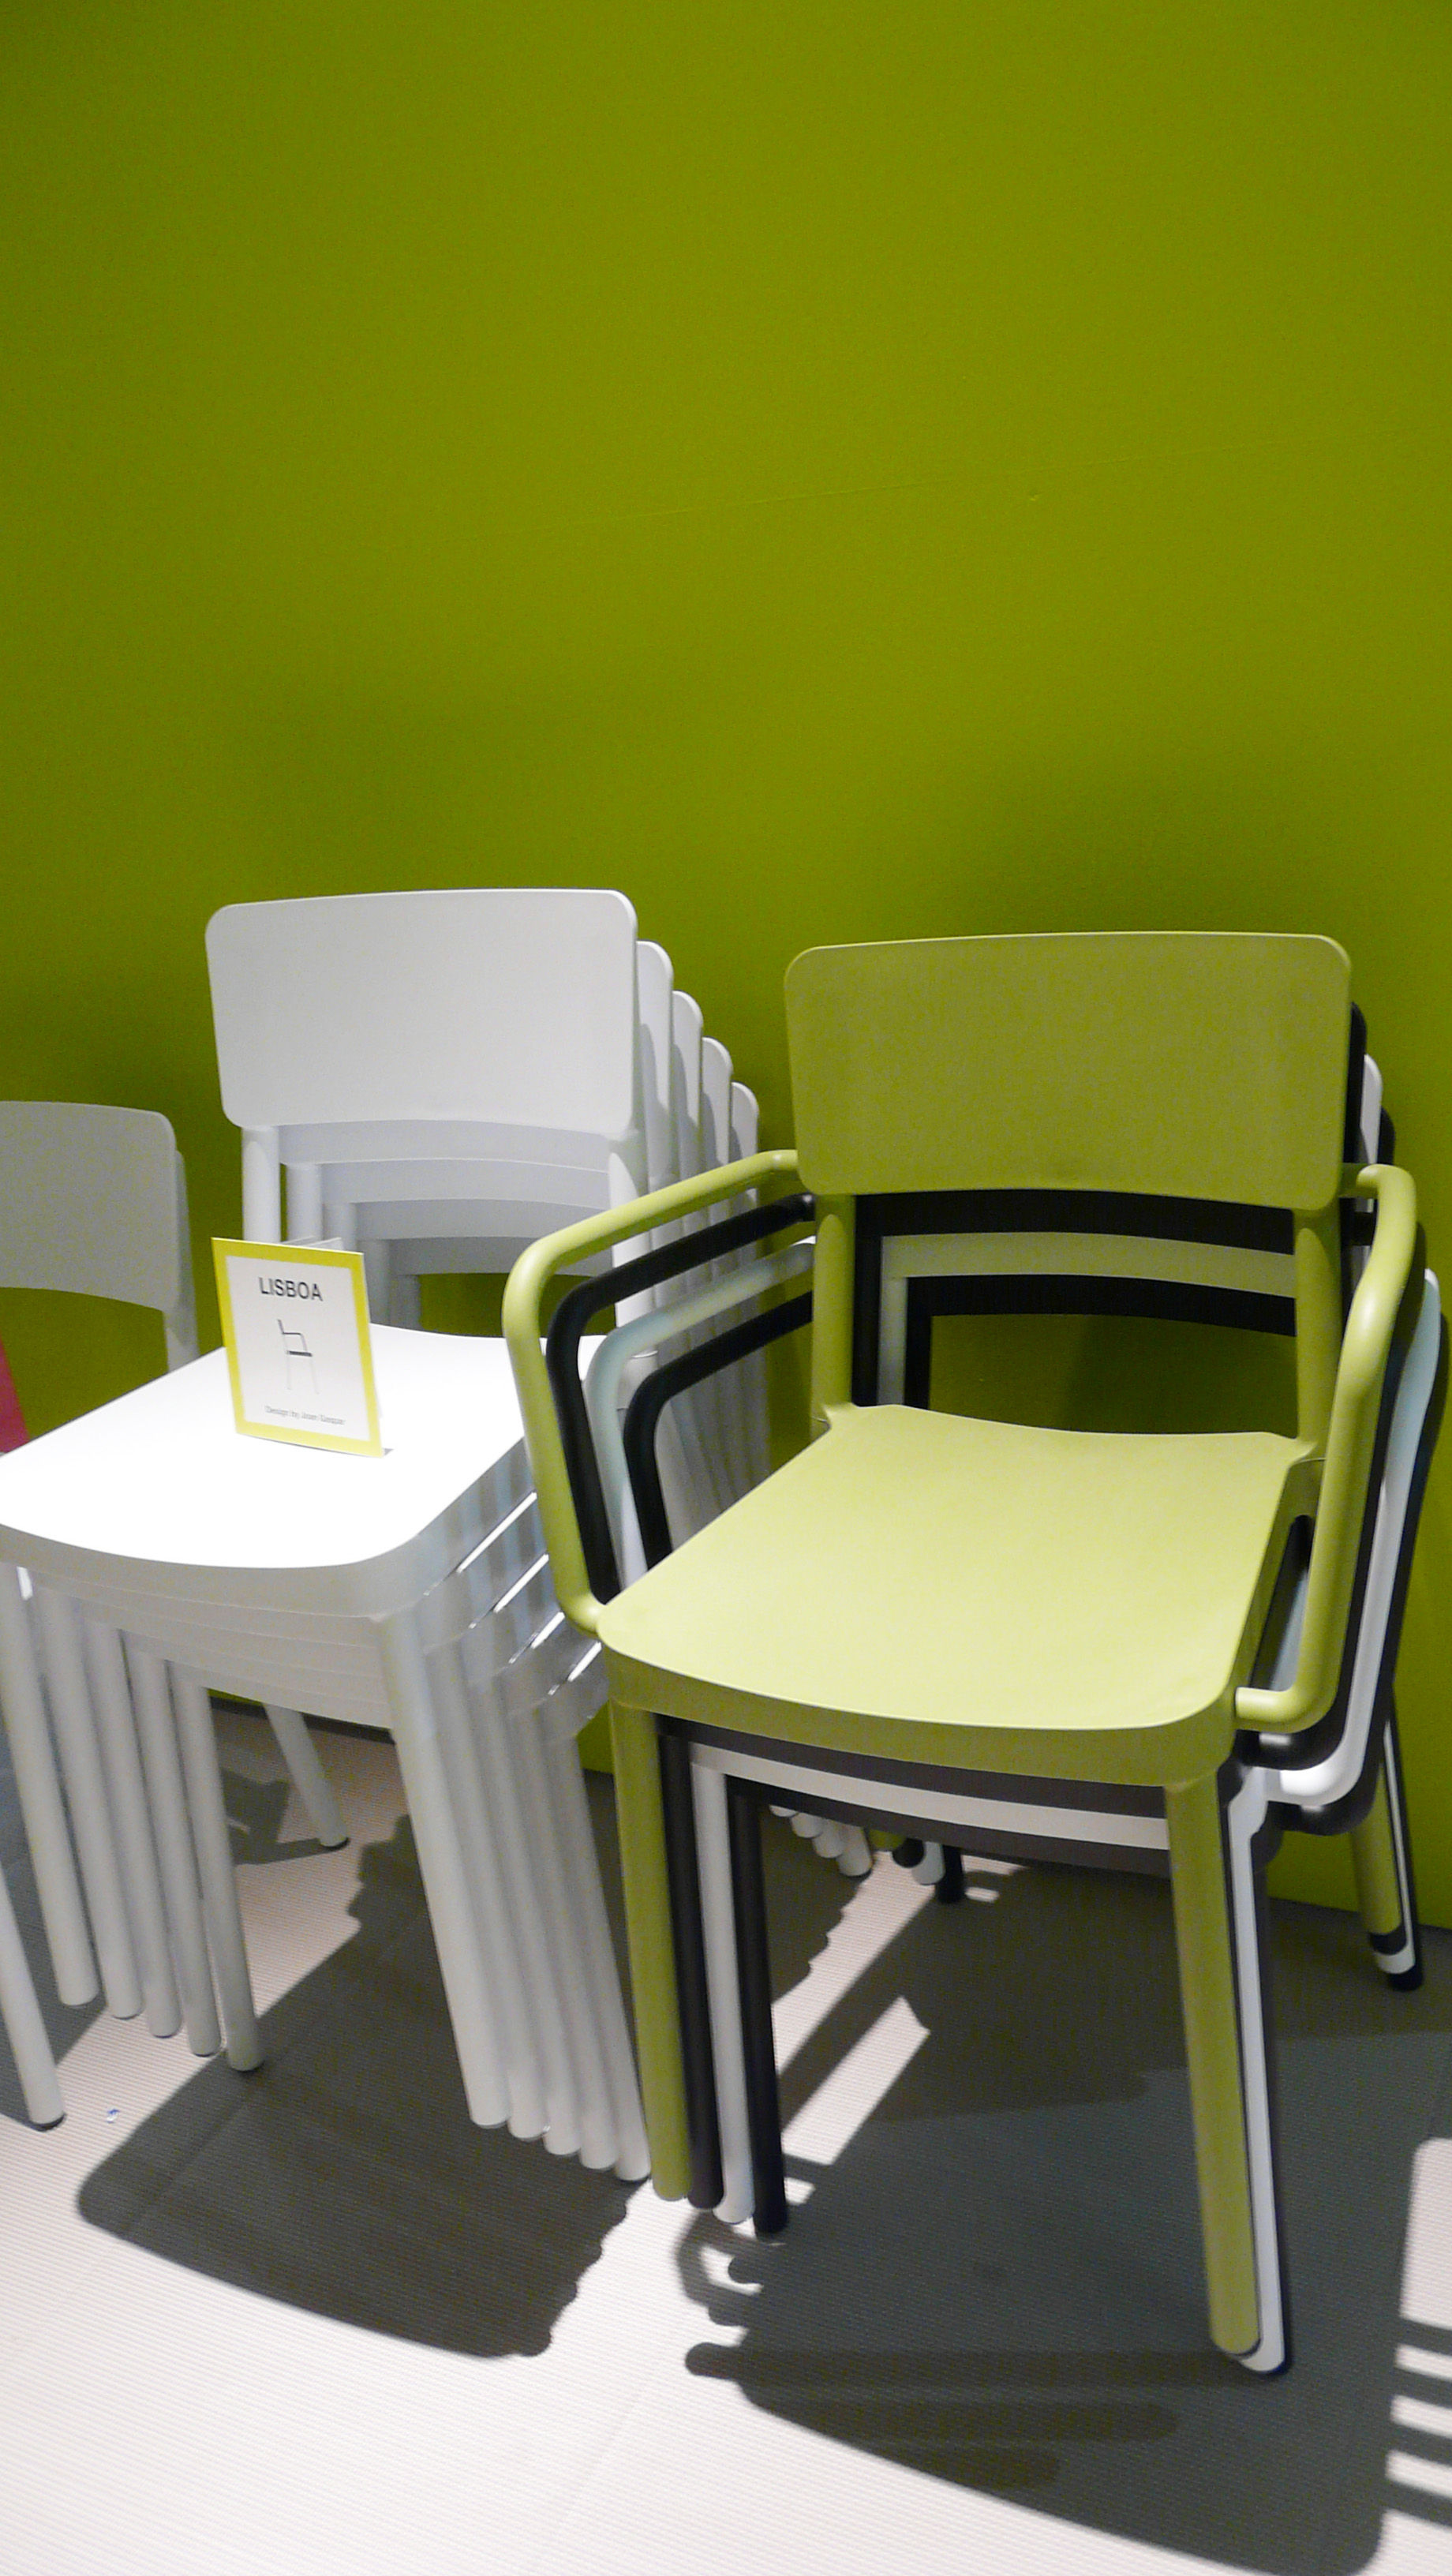 Lisboa chair olive green by serralunga for Serralunga furniture